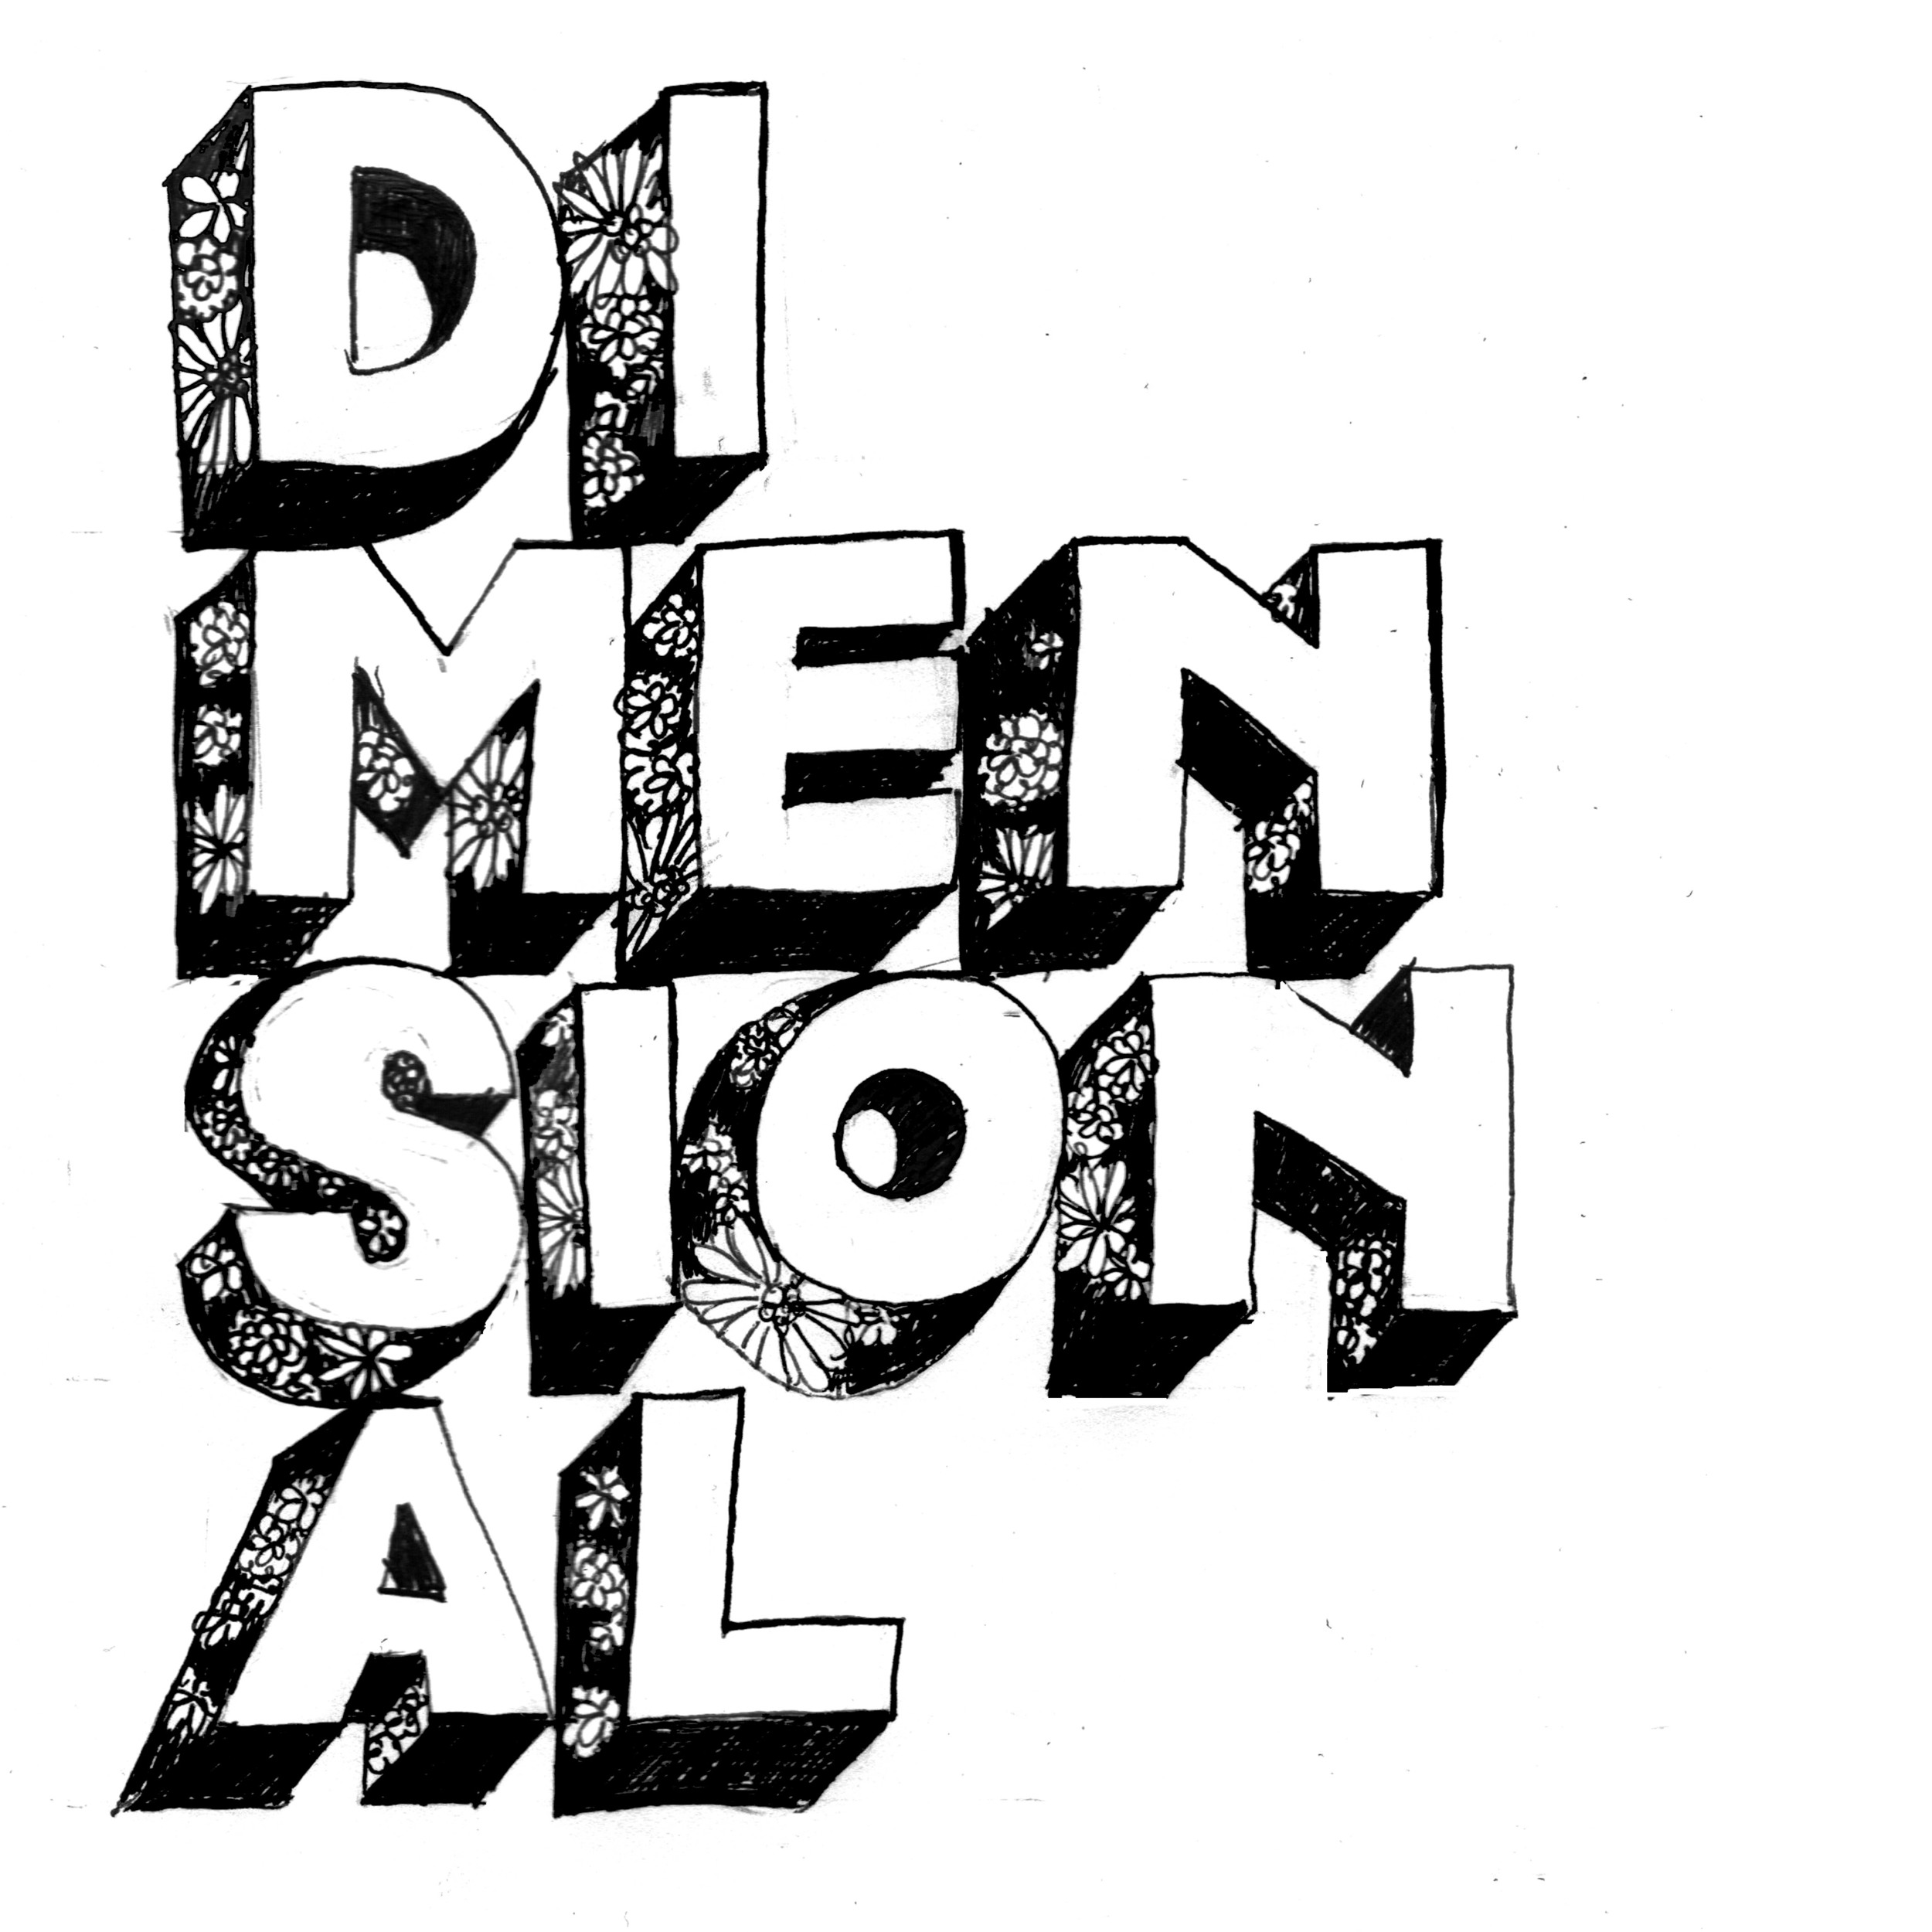 dimensional-divisionpage1.jpg